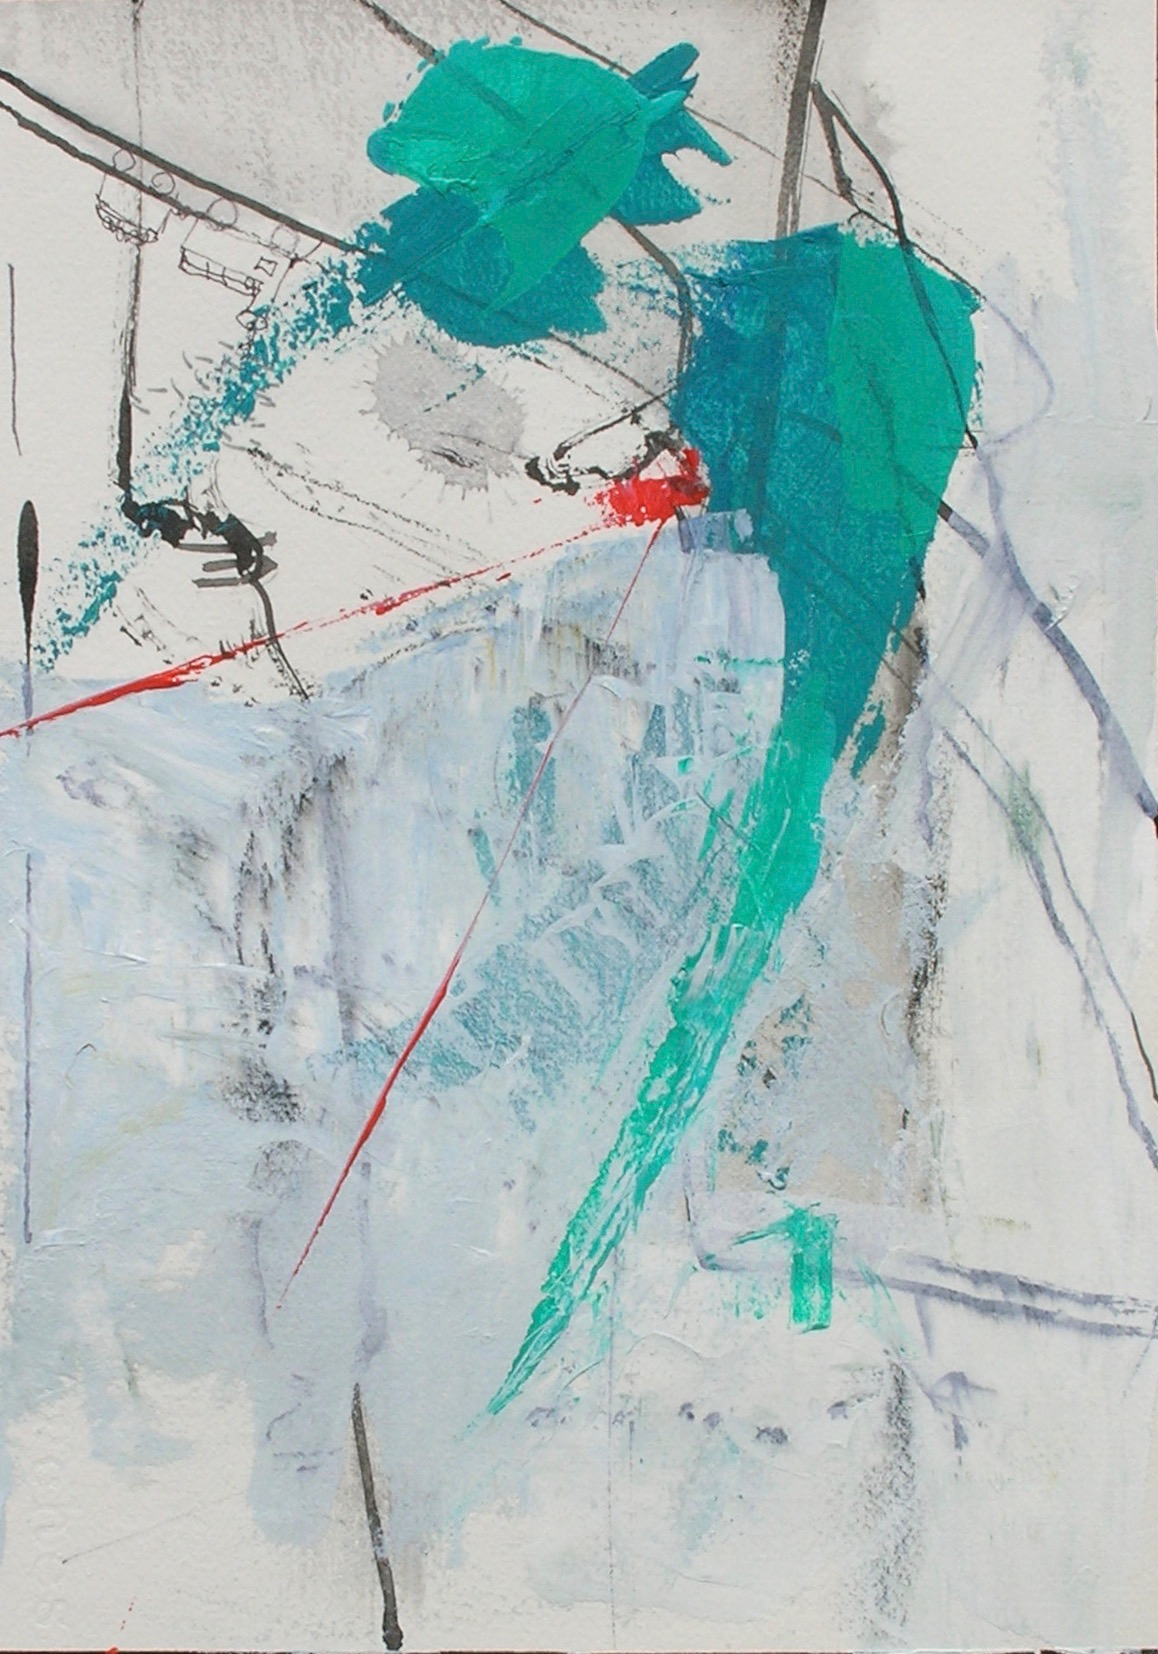 Untitled 2 2013